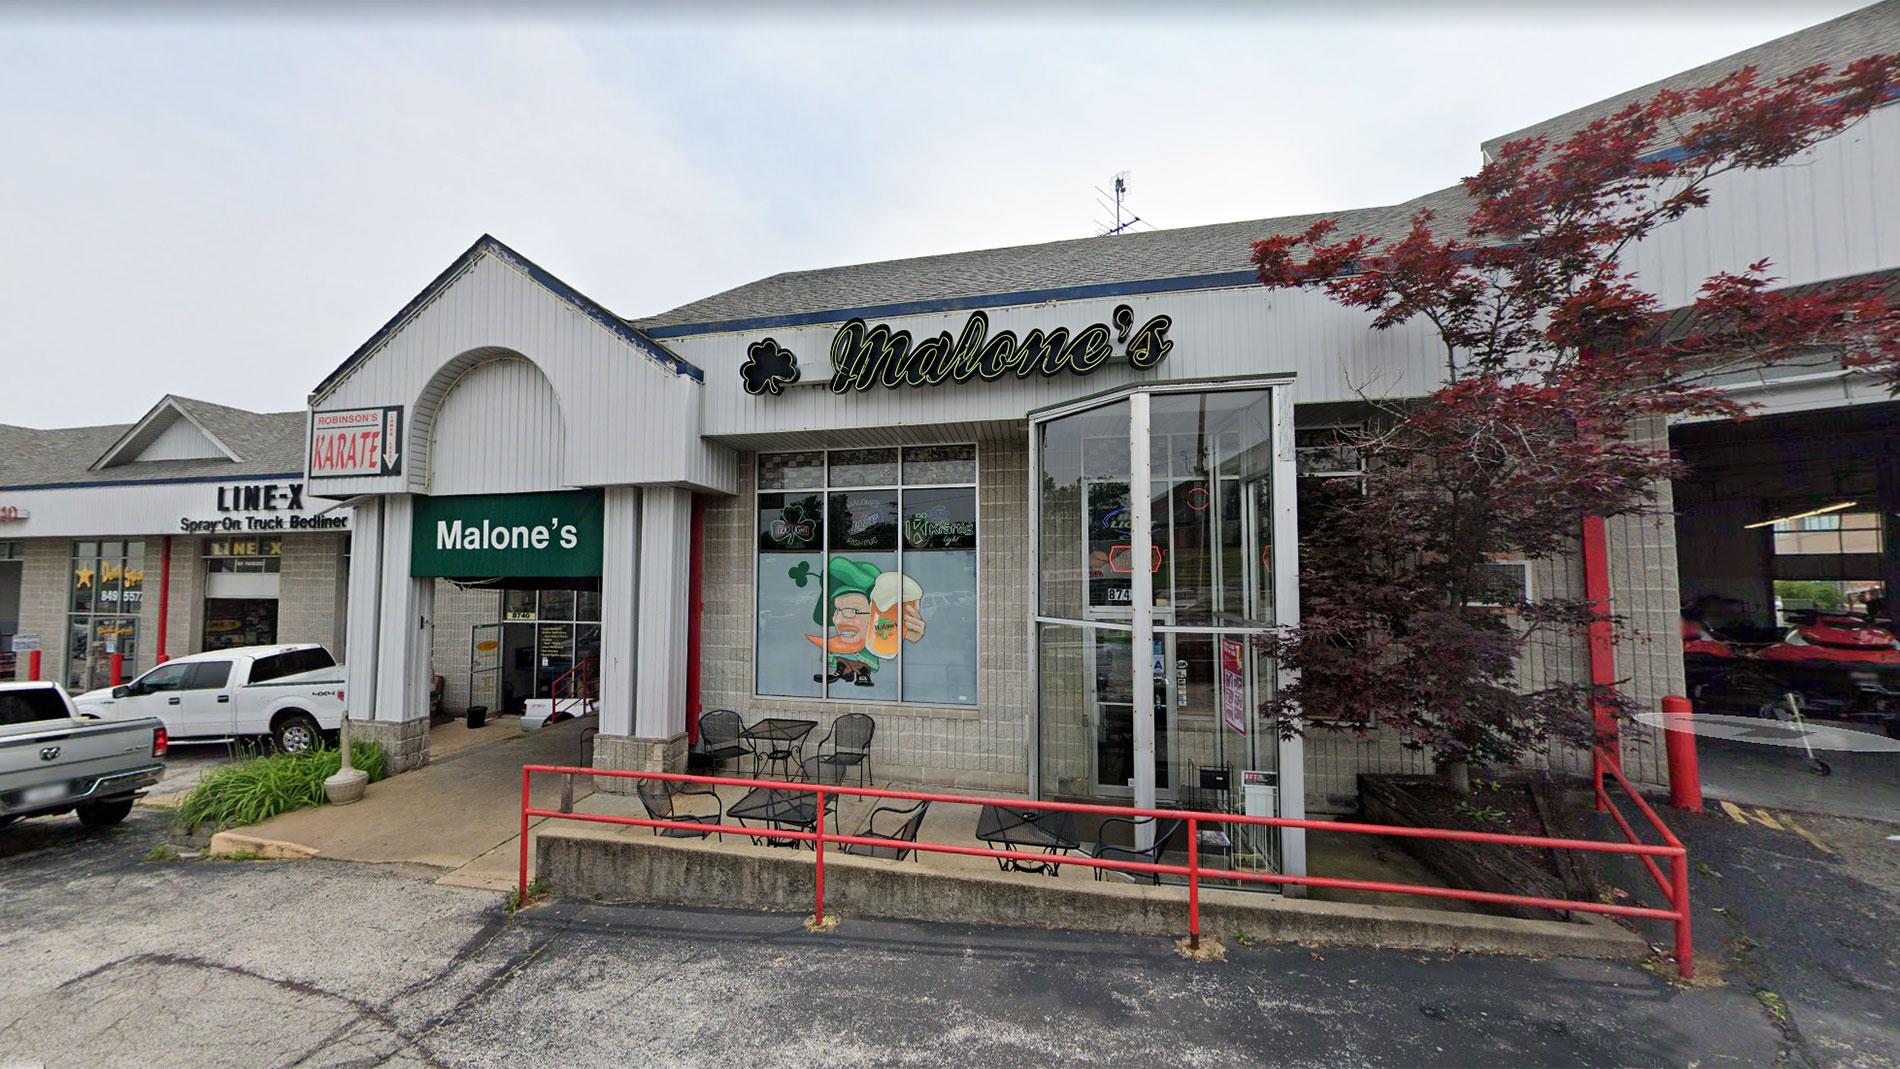 malone's grill & pub in st. louis